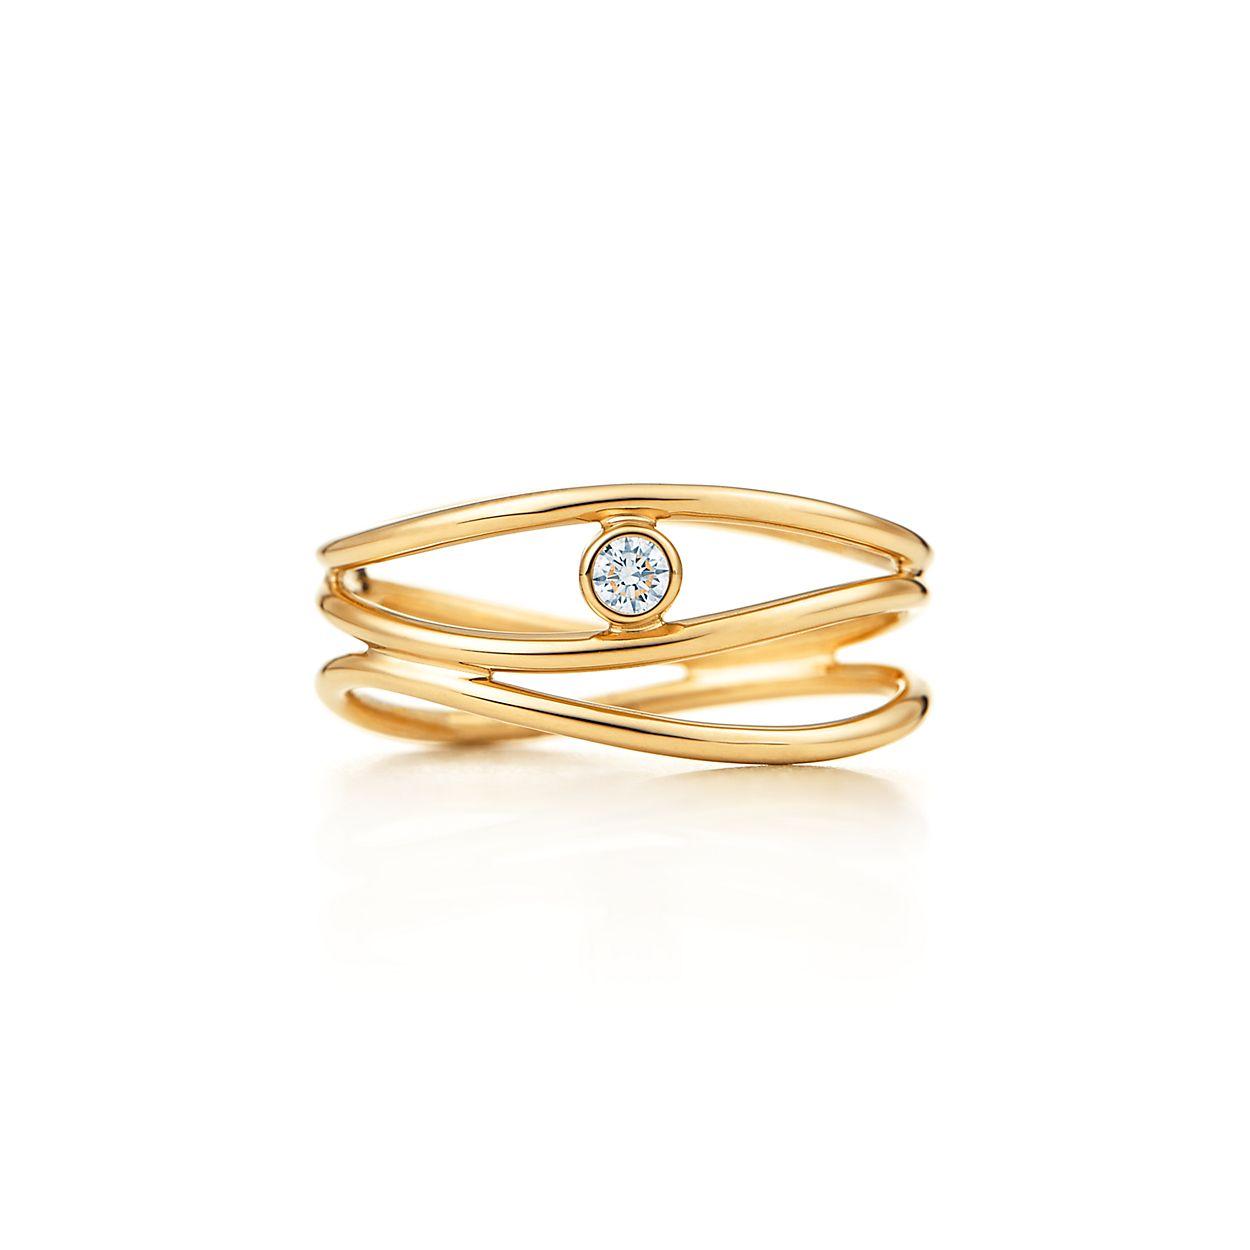 Elsa Peretti Wave single-row diamond ring in 18k gold - Size 5 1/2 Tiffany & Co. T5wMLGJUZh